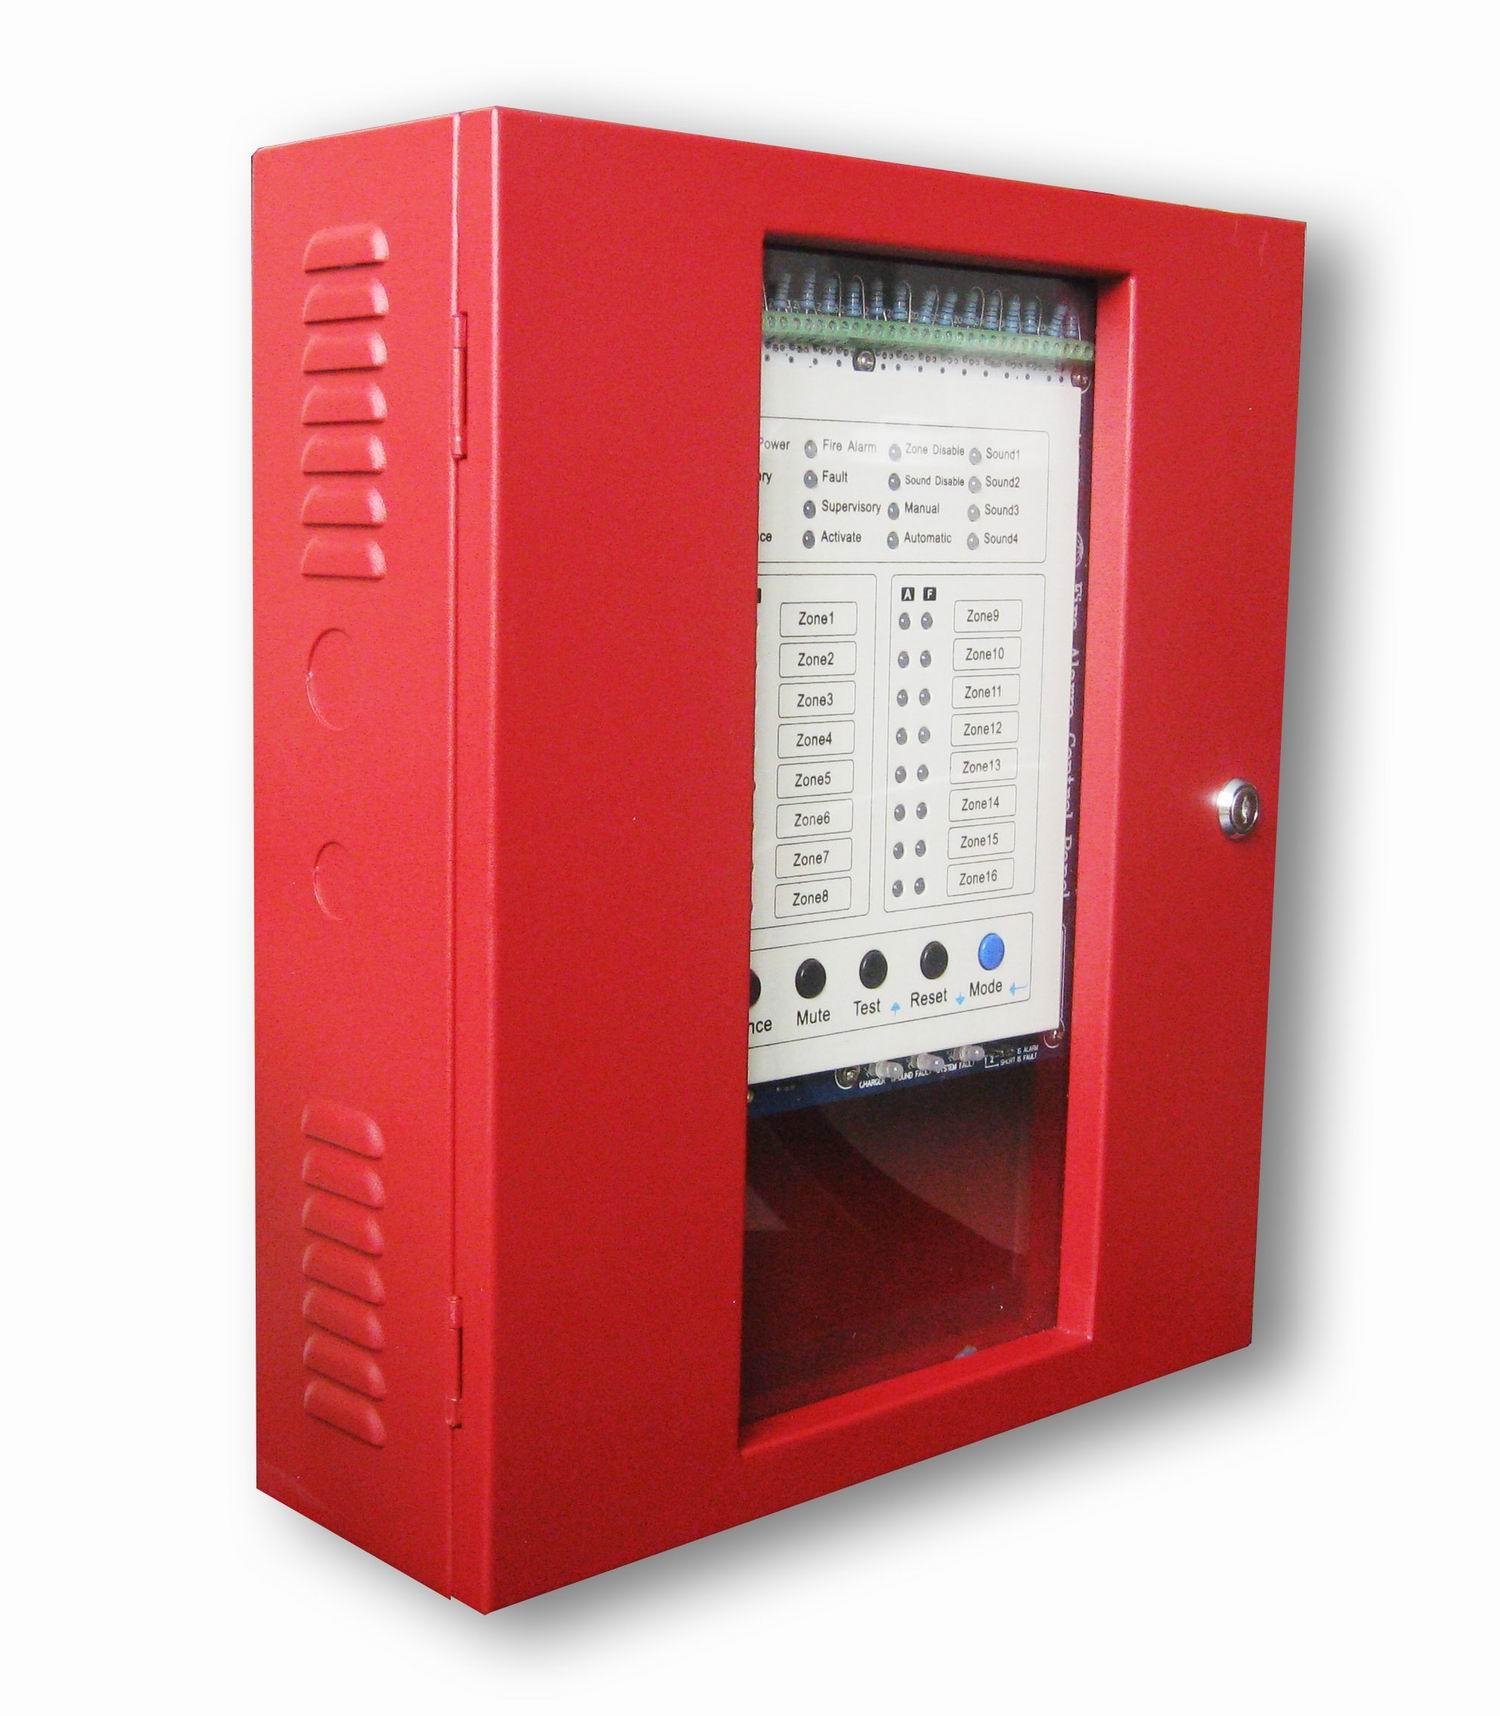 Fire-Alarm-System-HM-1004-